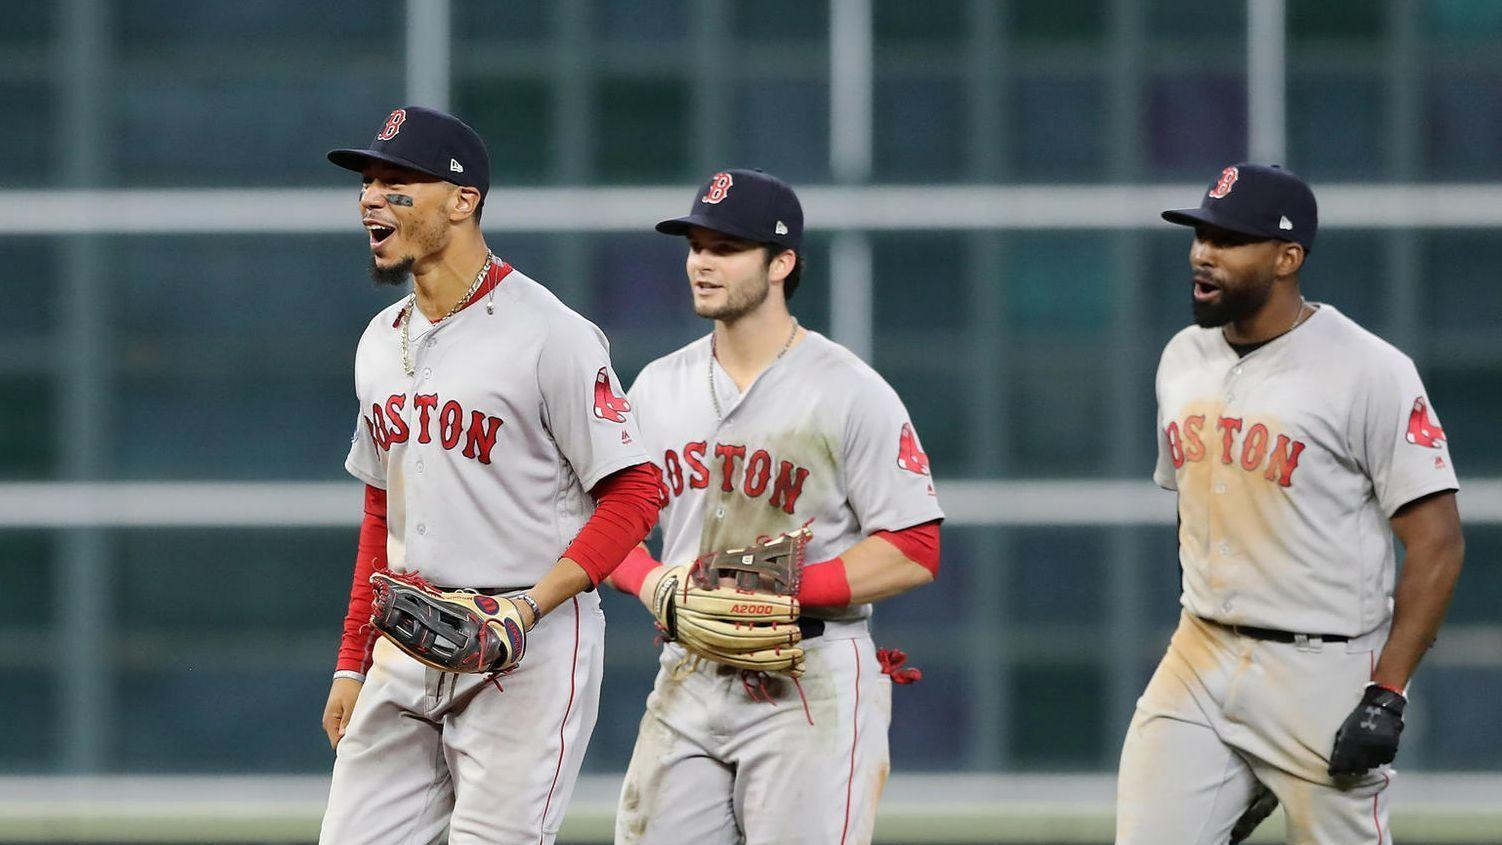 Andrew Benintendi's diving catch seals Red Sox's Game 4 win in ALCS